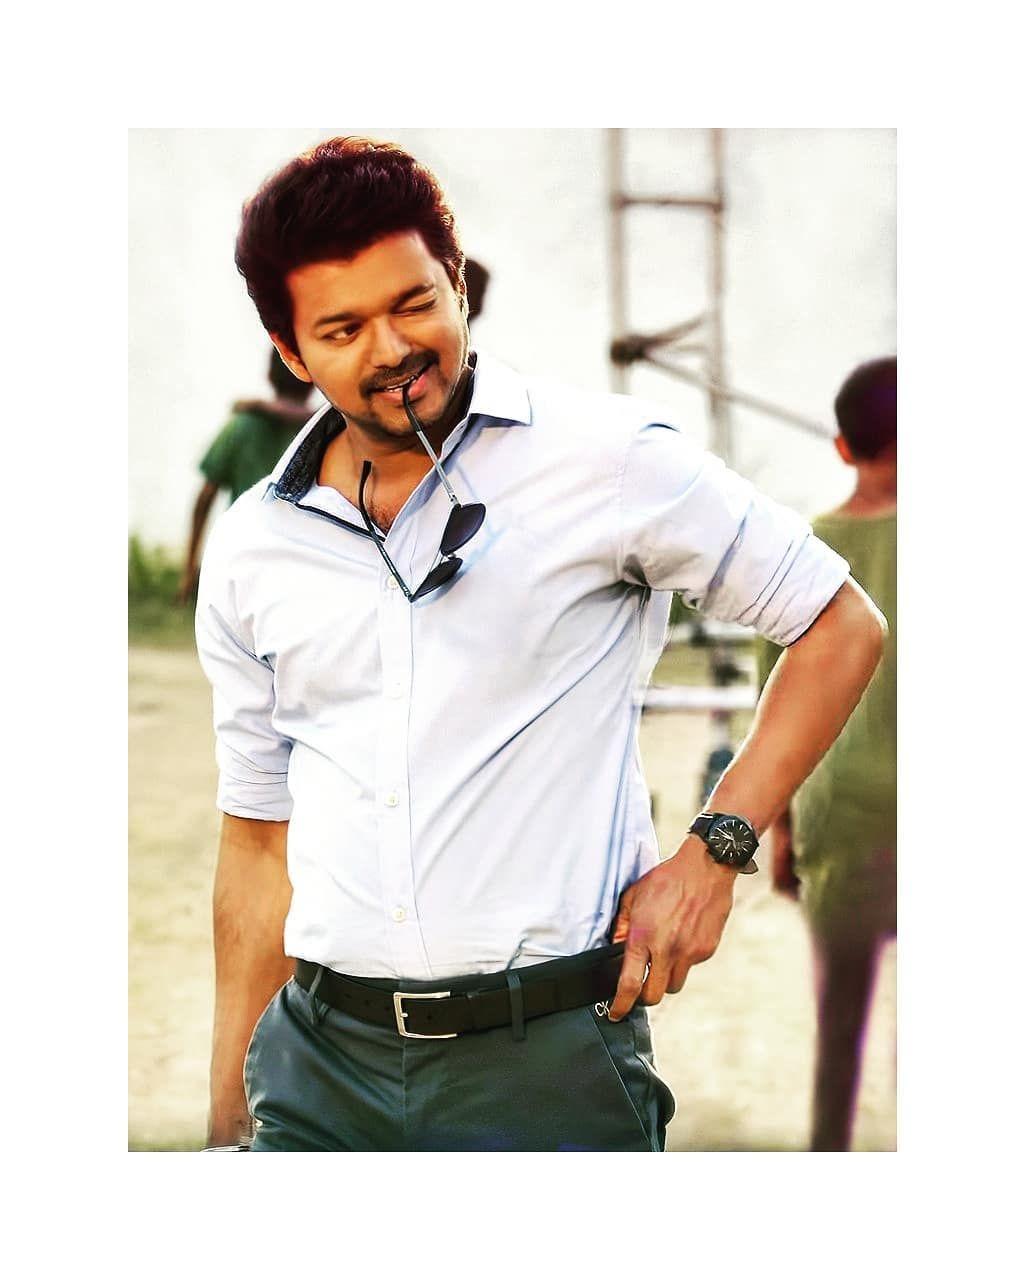 Tumblr Vijay actor, Actor photo, Most handsome actors